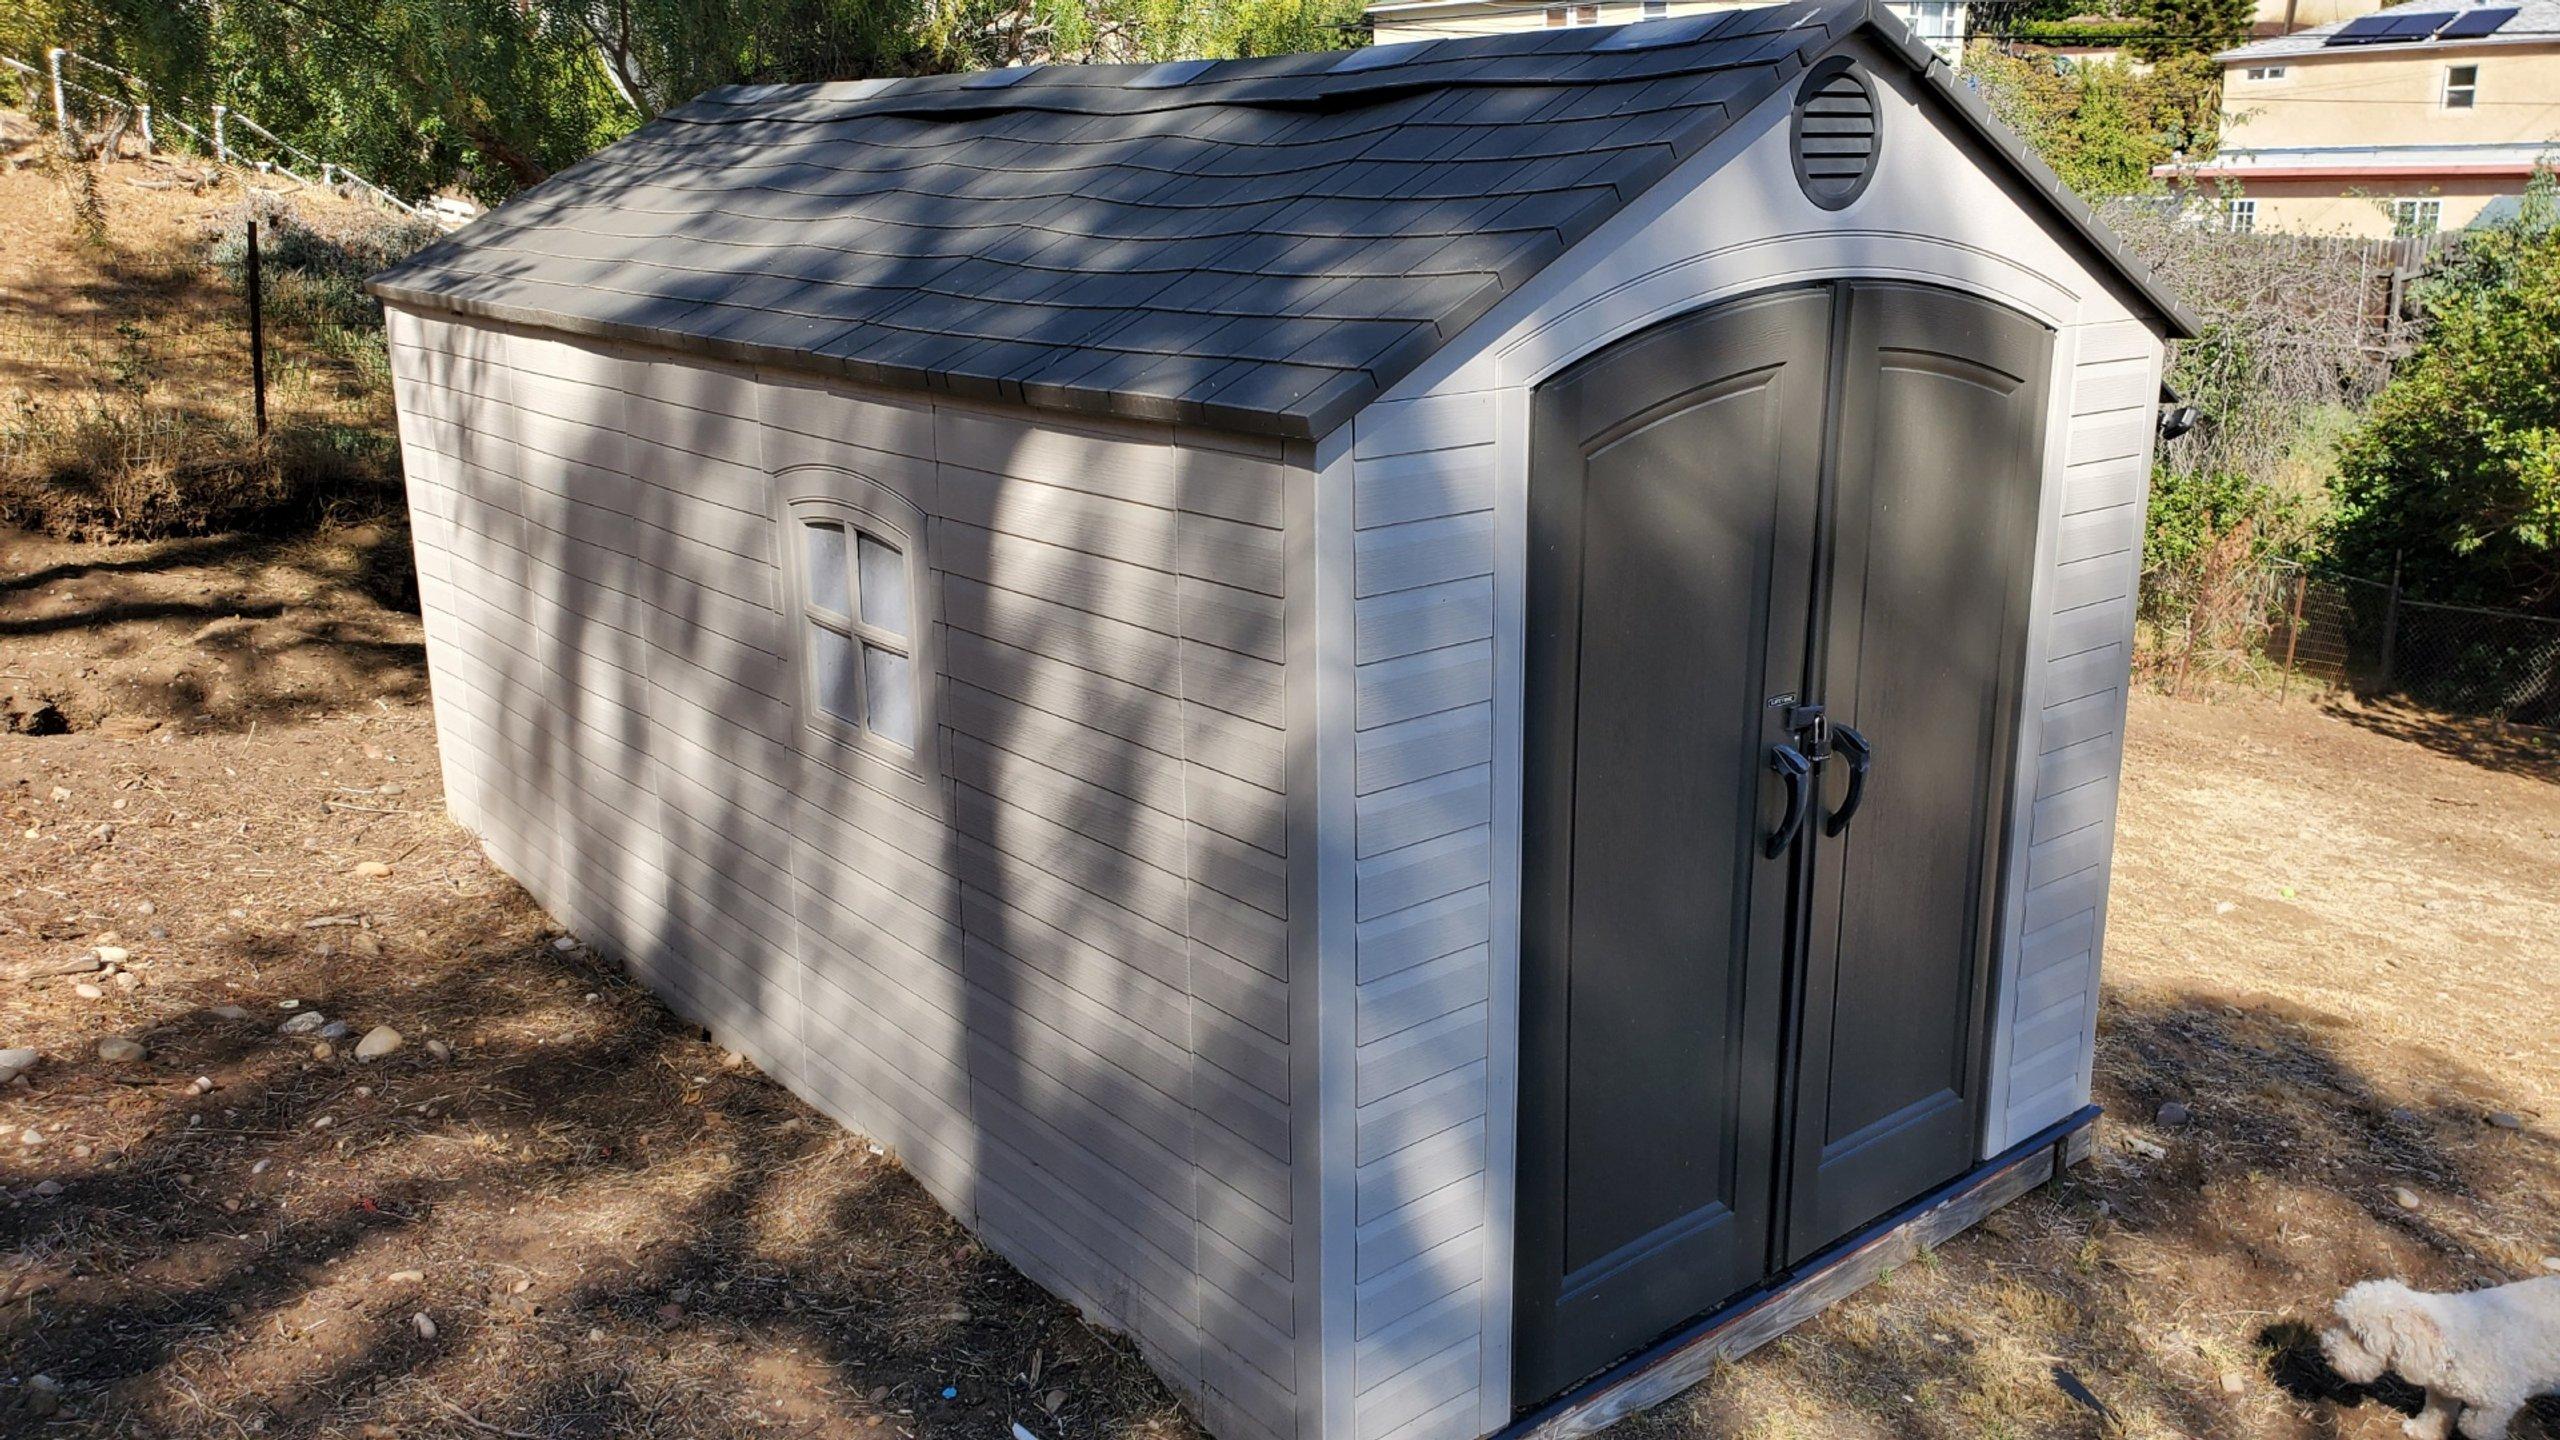 12x6 Shed self storage unit